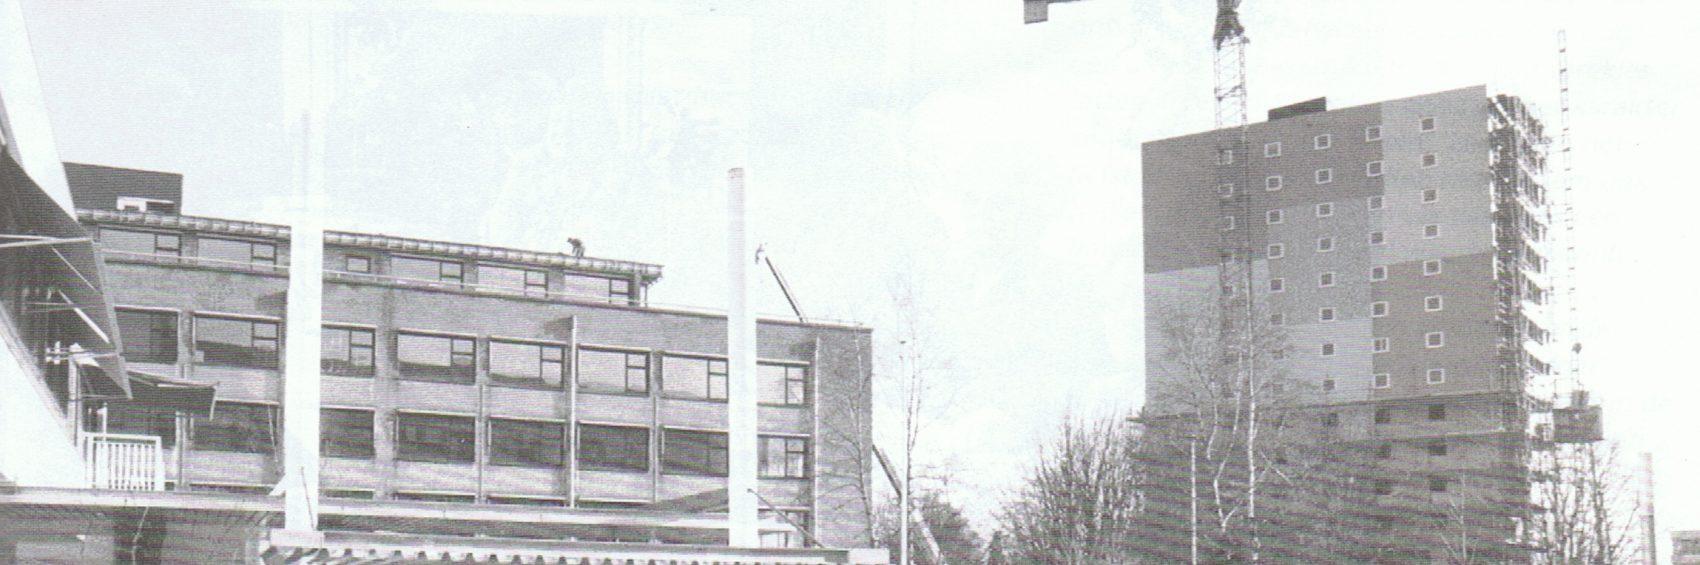 1994.11 - Heymanscentrum - Hoogheem - Bouw - 1994